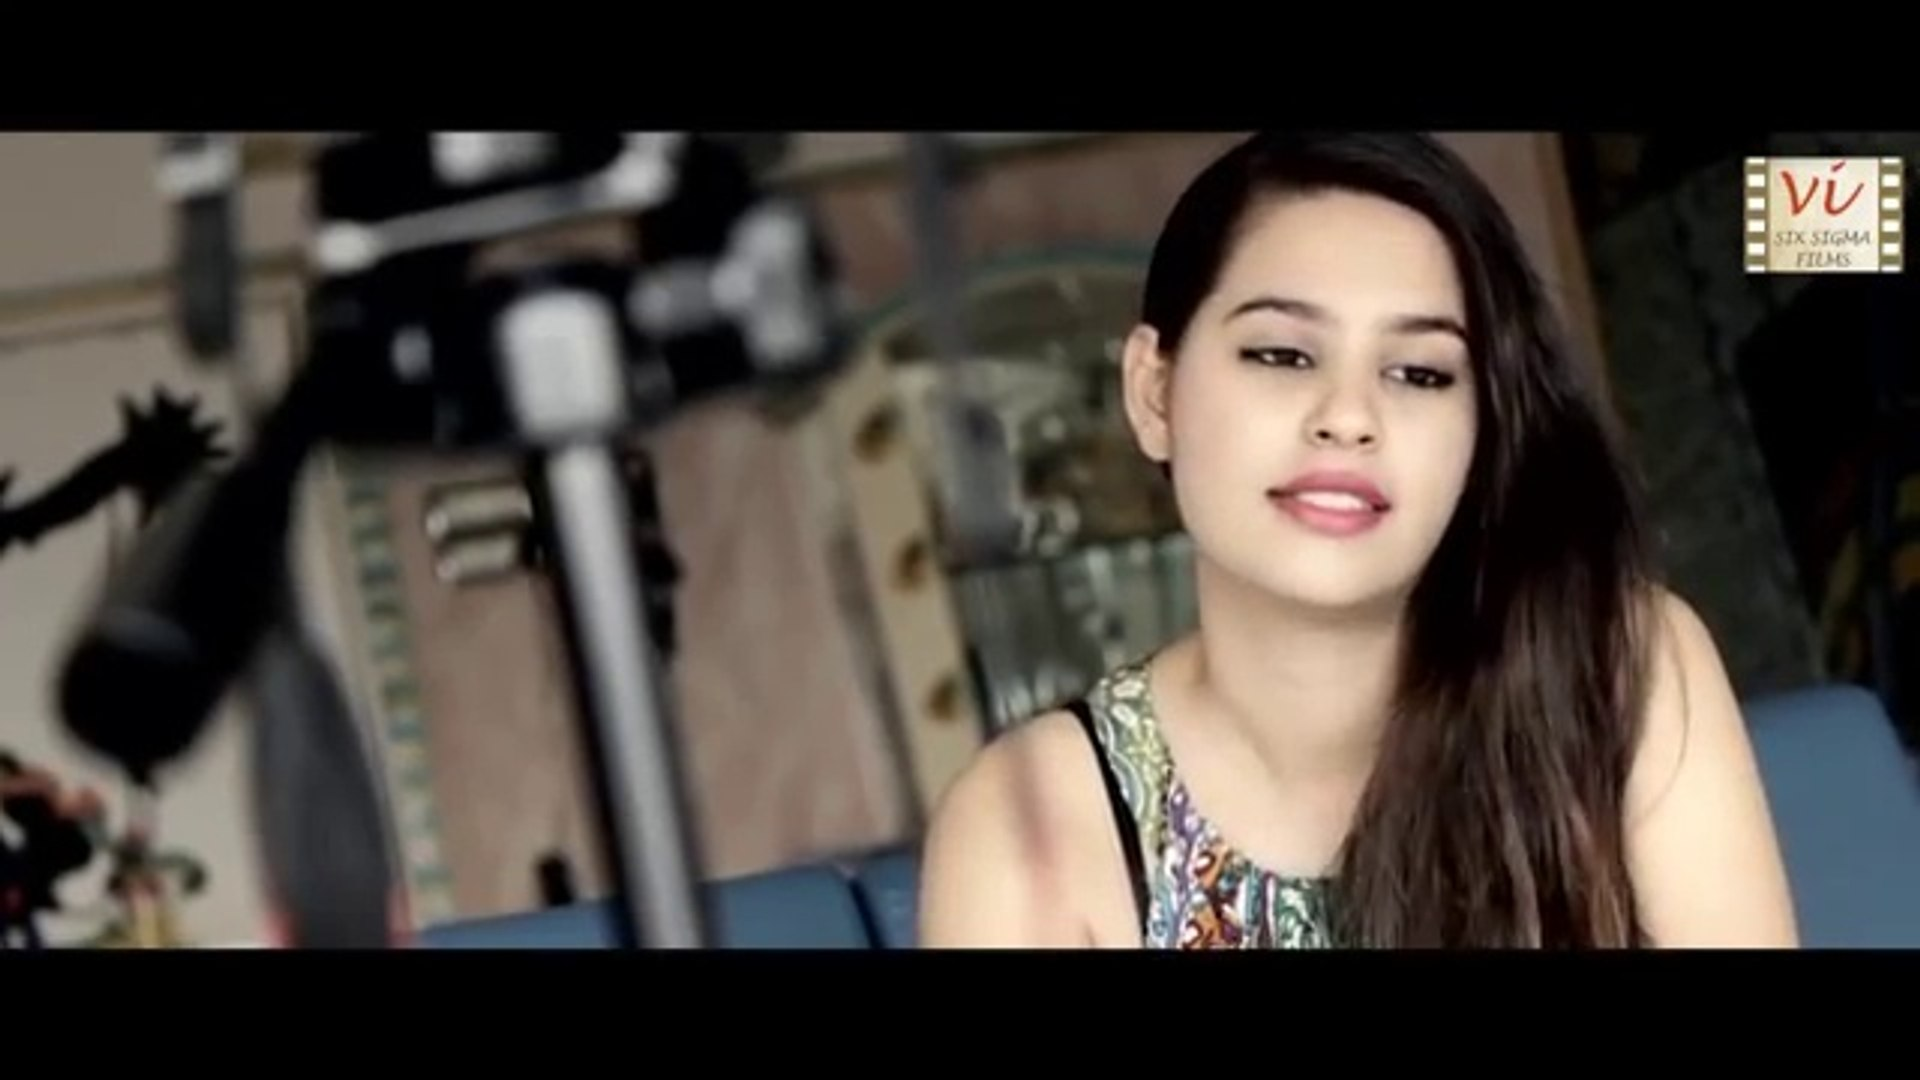 Abhisarika -  A Call Girl - One million+ Views -  Indian Short Film - Six Sigma Films